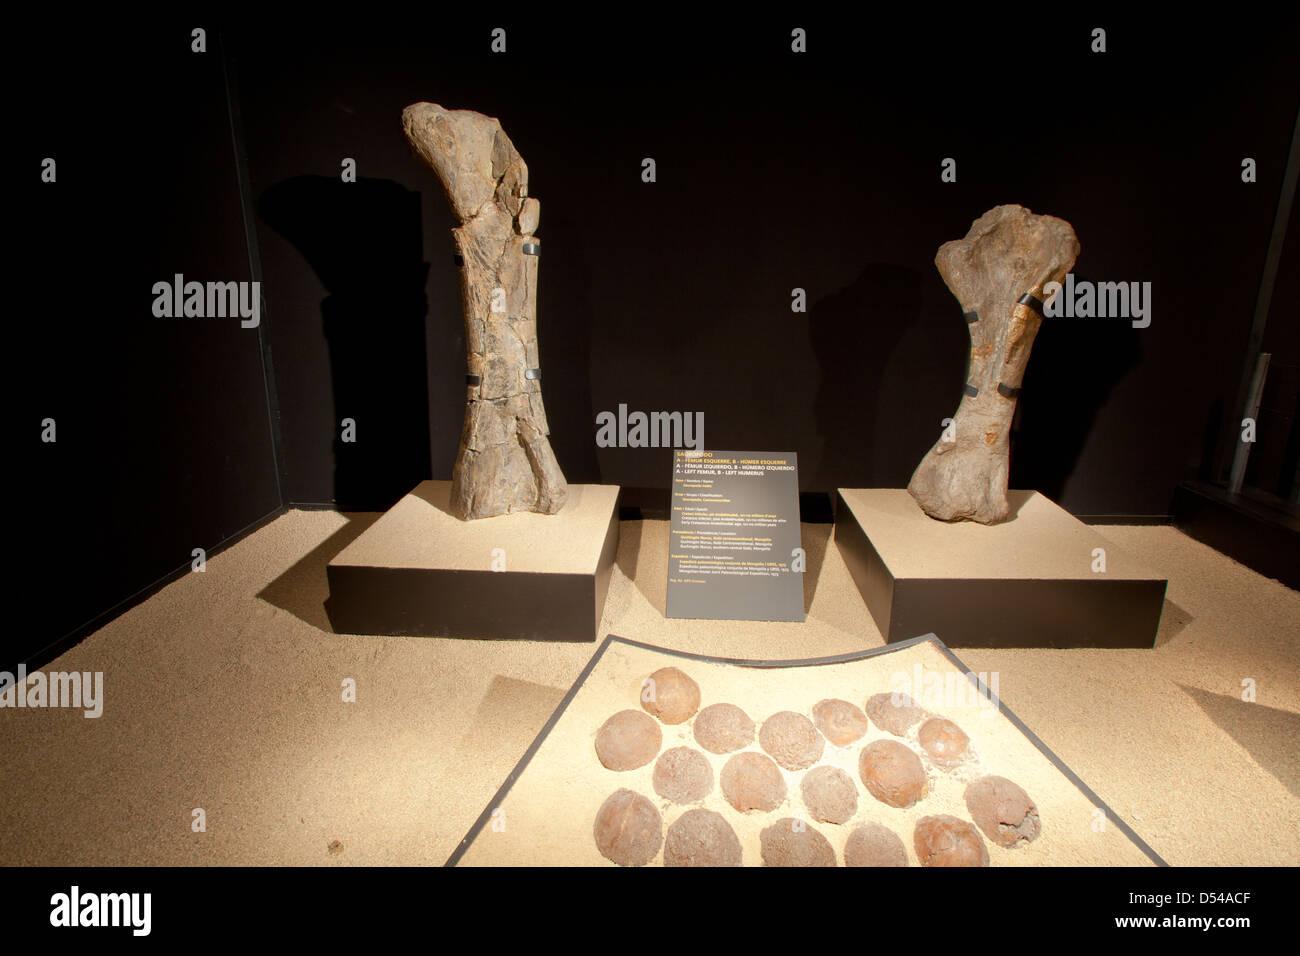 Extremities and eggs of Sauropodo, Exposition of Dinosaurs from Gobi desert in Mongolia. Cosmocaixa museum, Barcelona, - Stock Image